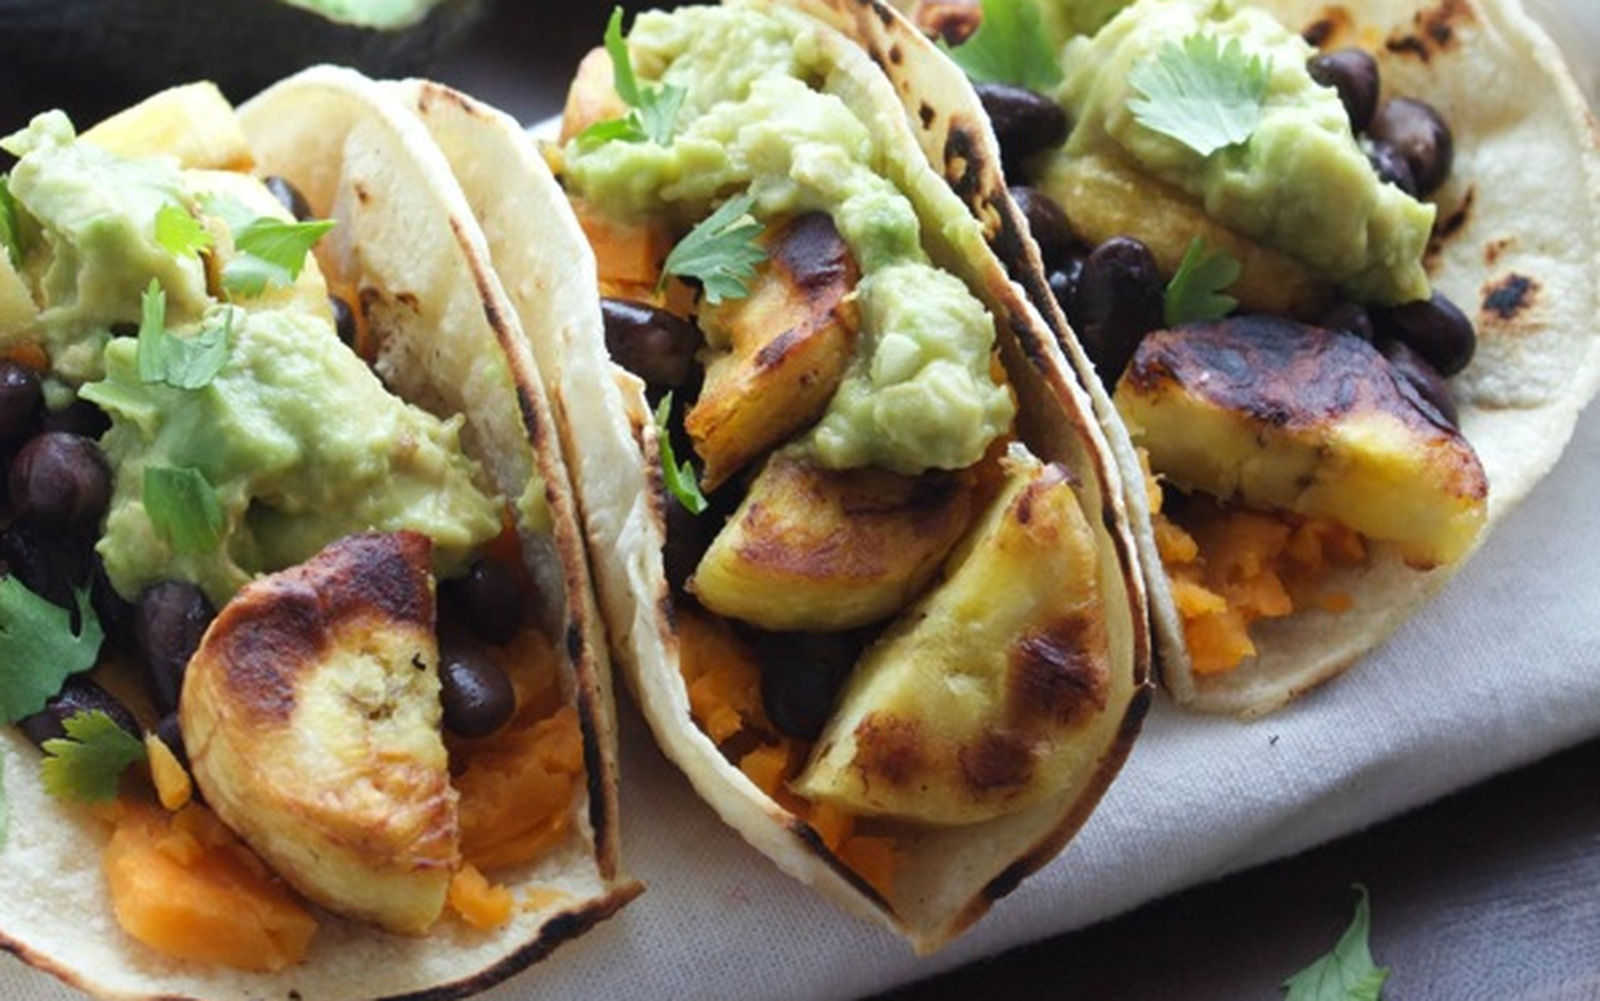 Plantain Sweet Potato Tacos With Guacamole [Vegan, Gluten-Free]